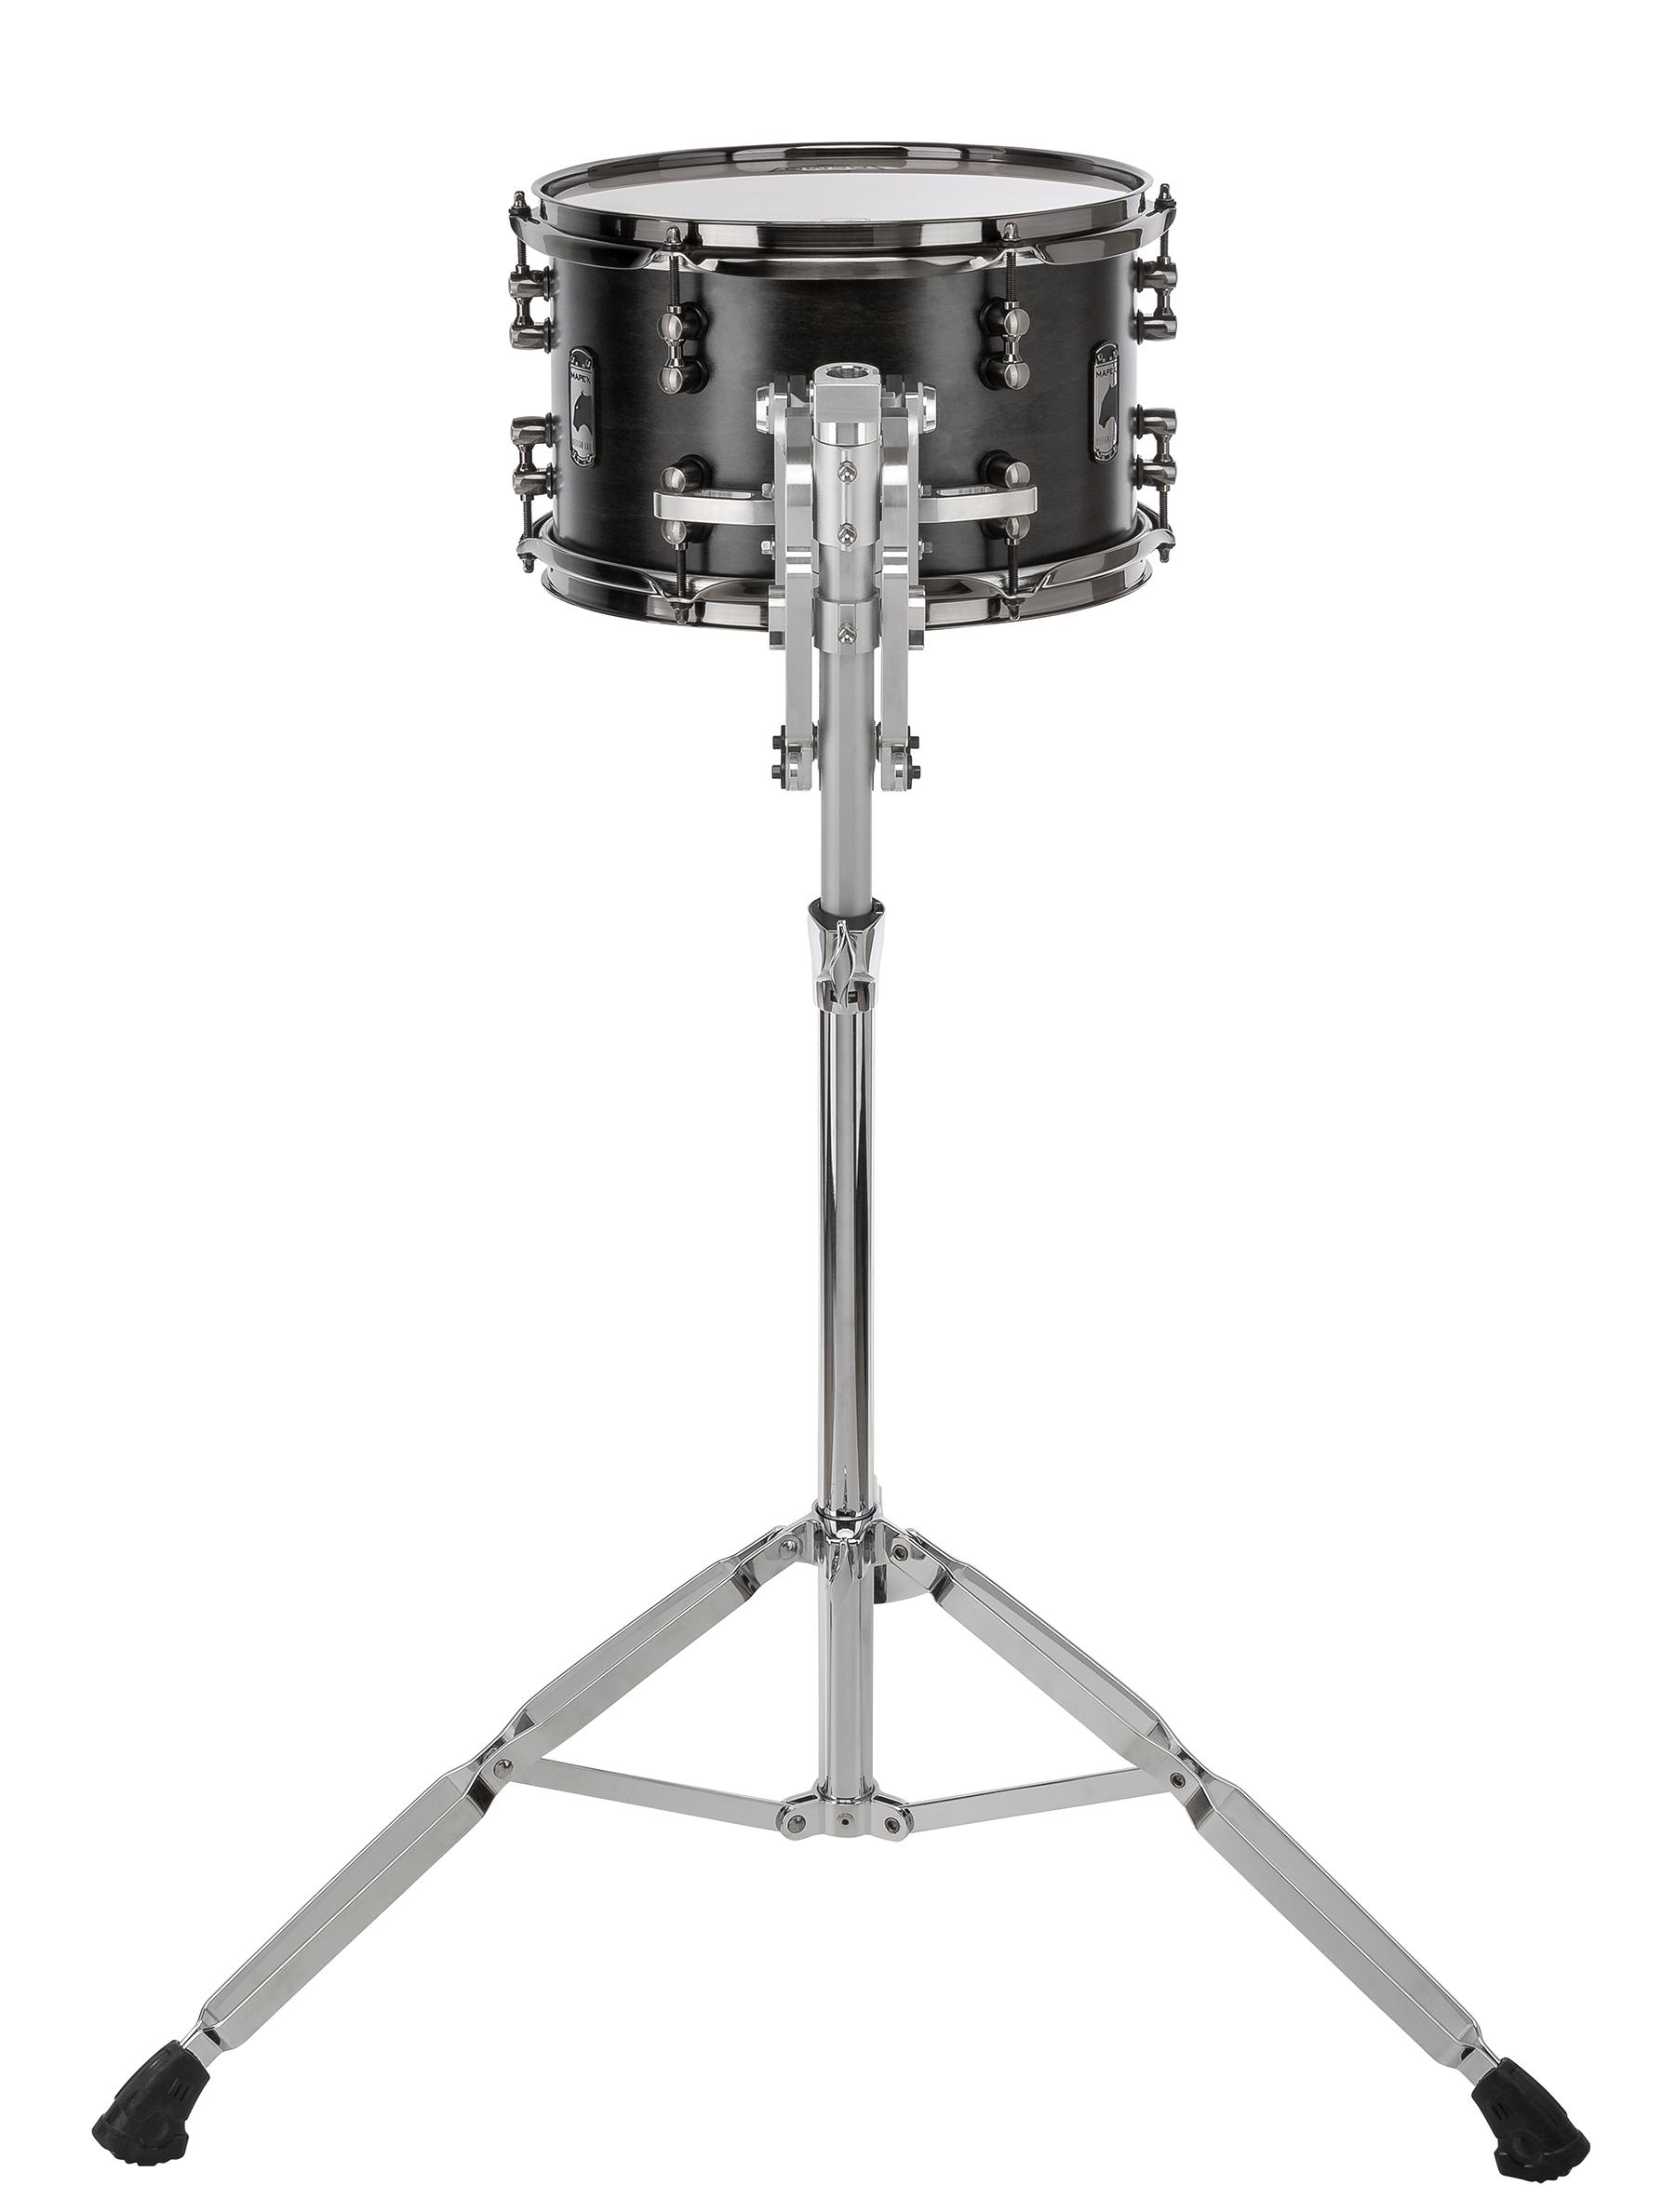 MAATS-with-drums-04.jpg